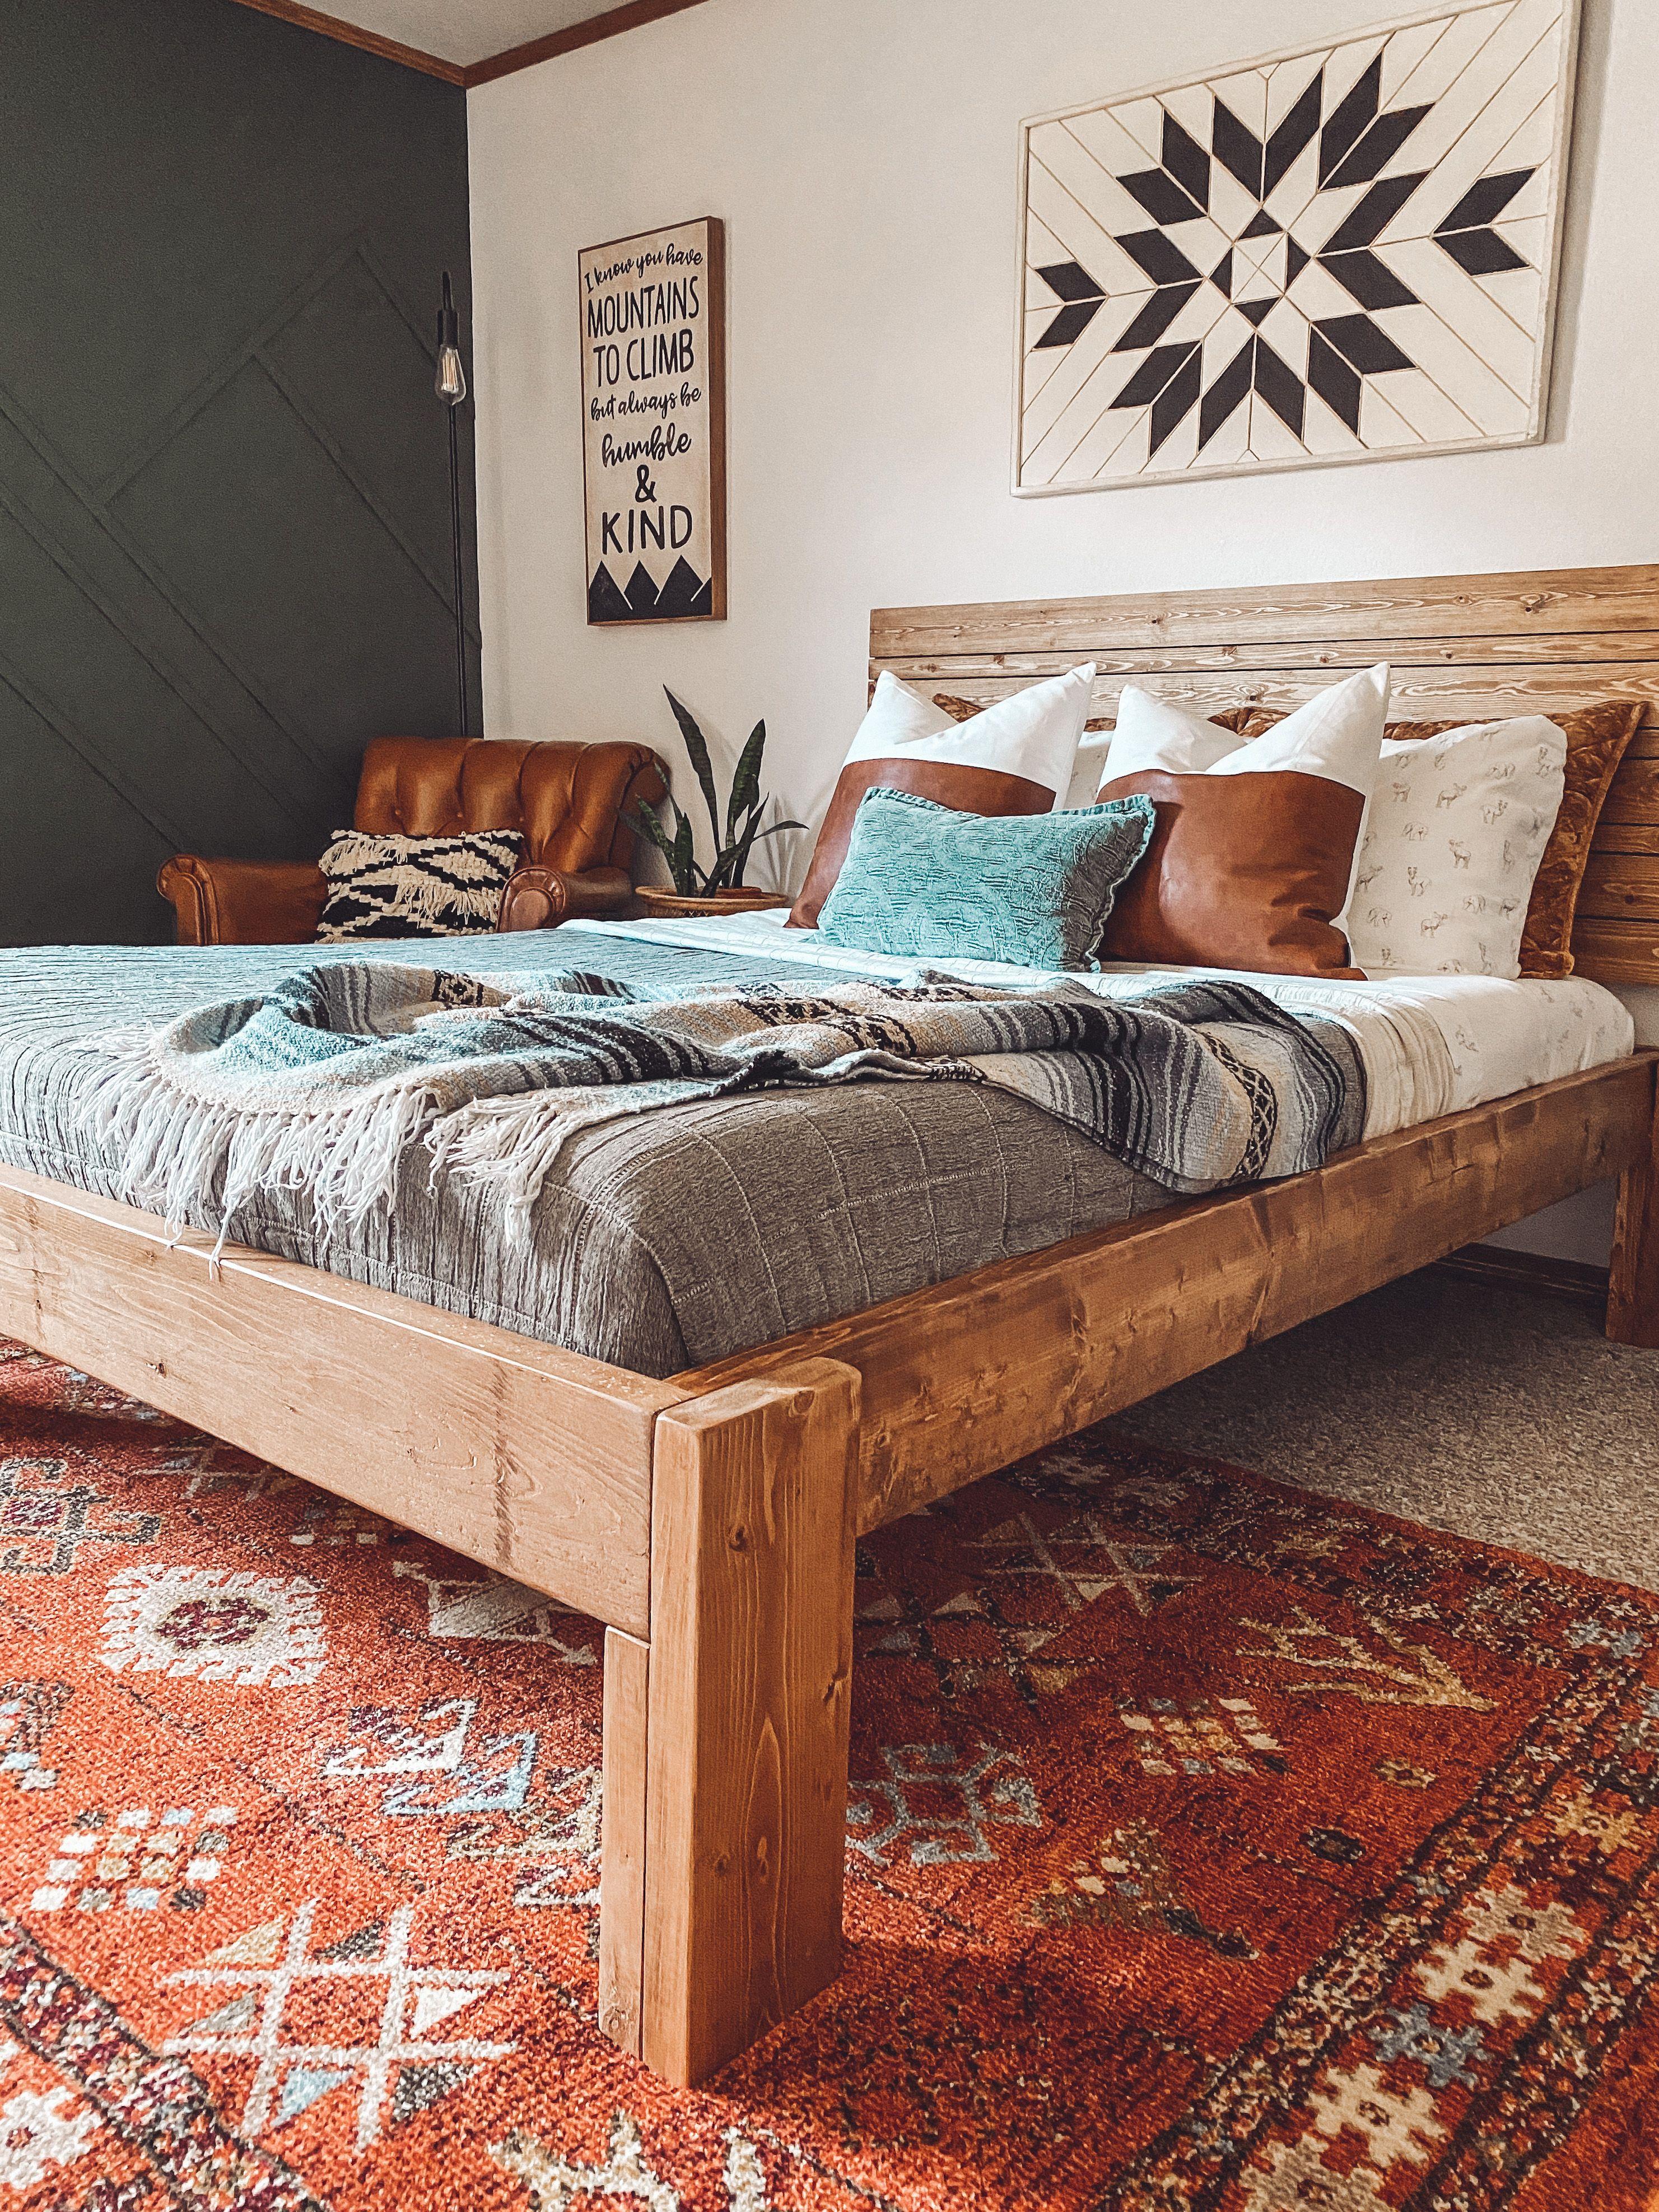 Modern Mountain Bedroom - One Room Challenge Reveal